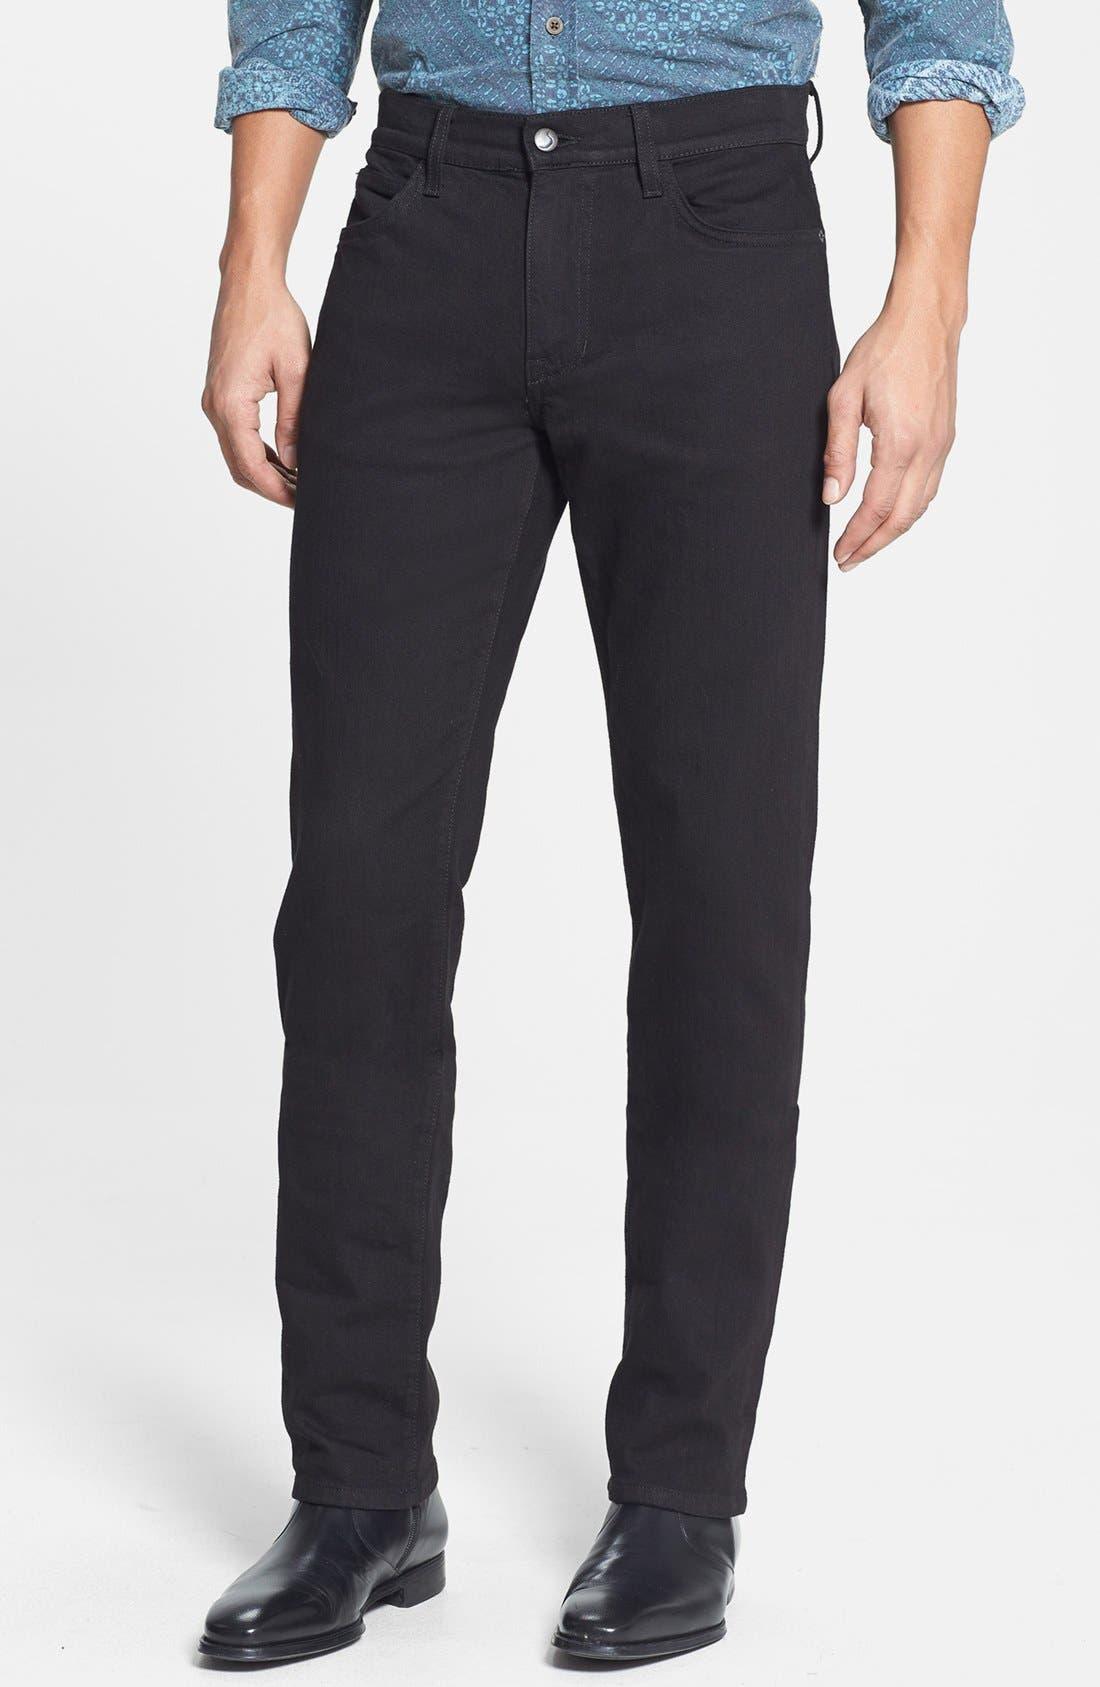 Alternate Image 1 Selected - Joe's 'Brixton' Slim Fit Jeans (Jet Black)